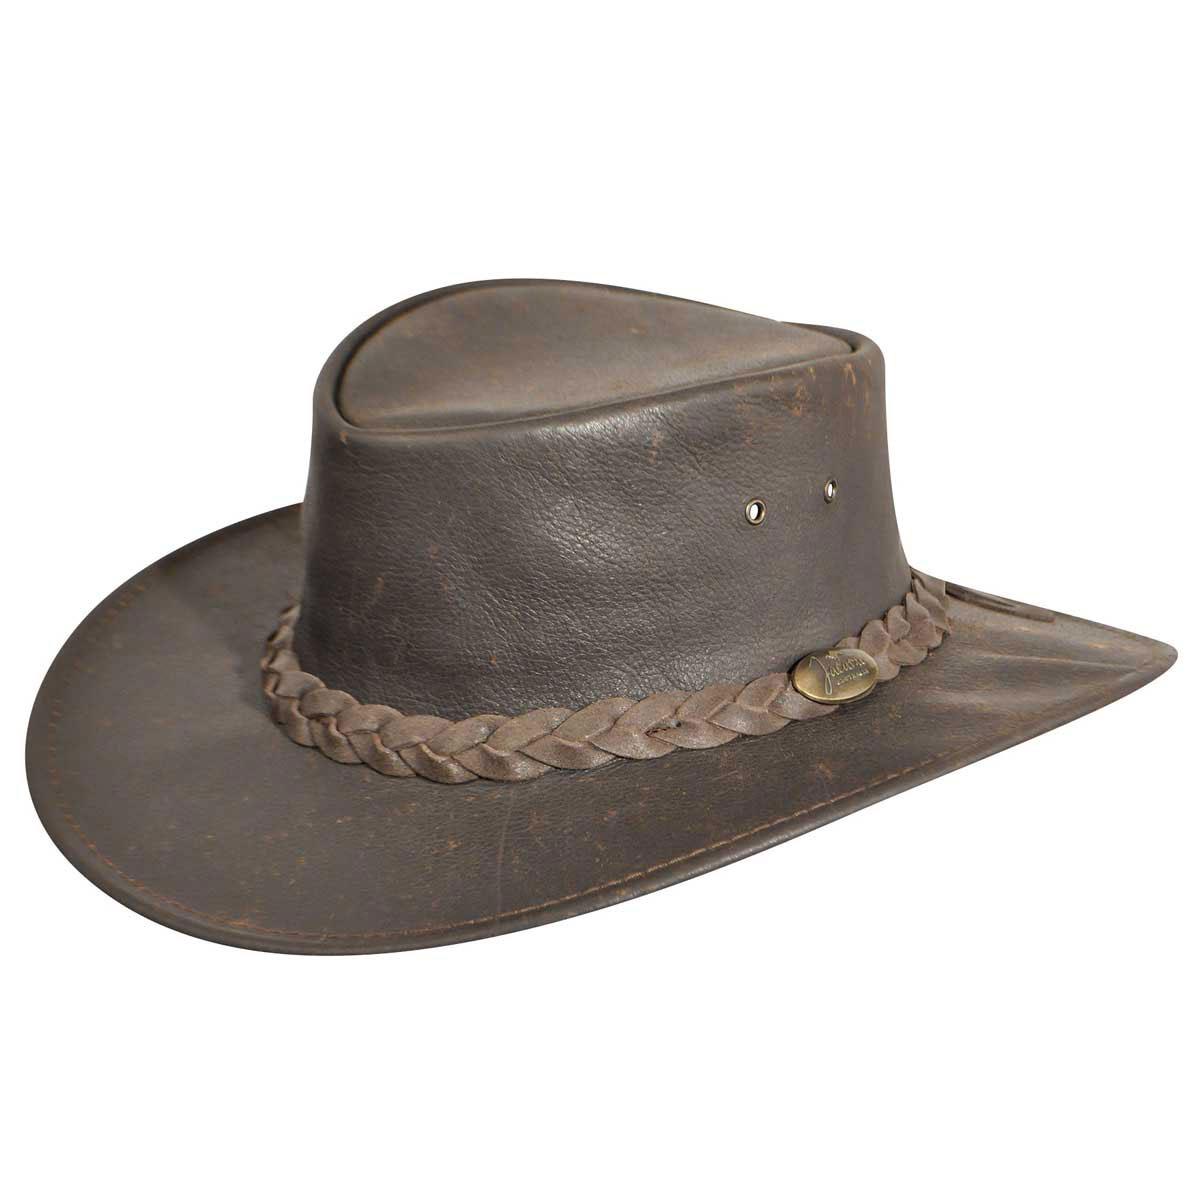 Jacaru Explorer Outback Hat in Stonewash